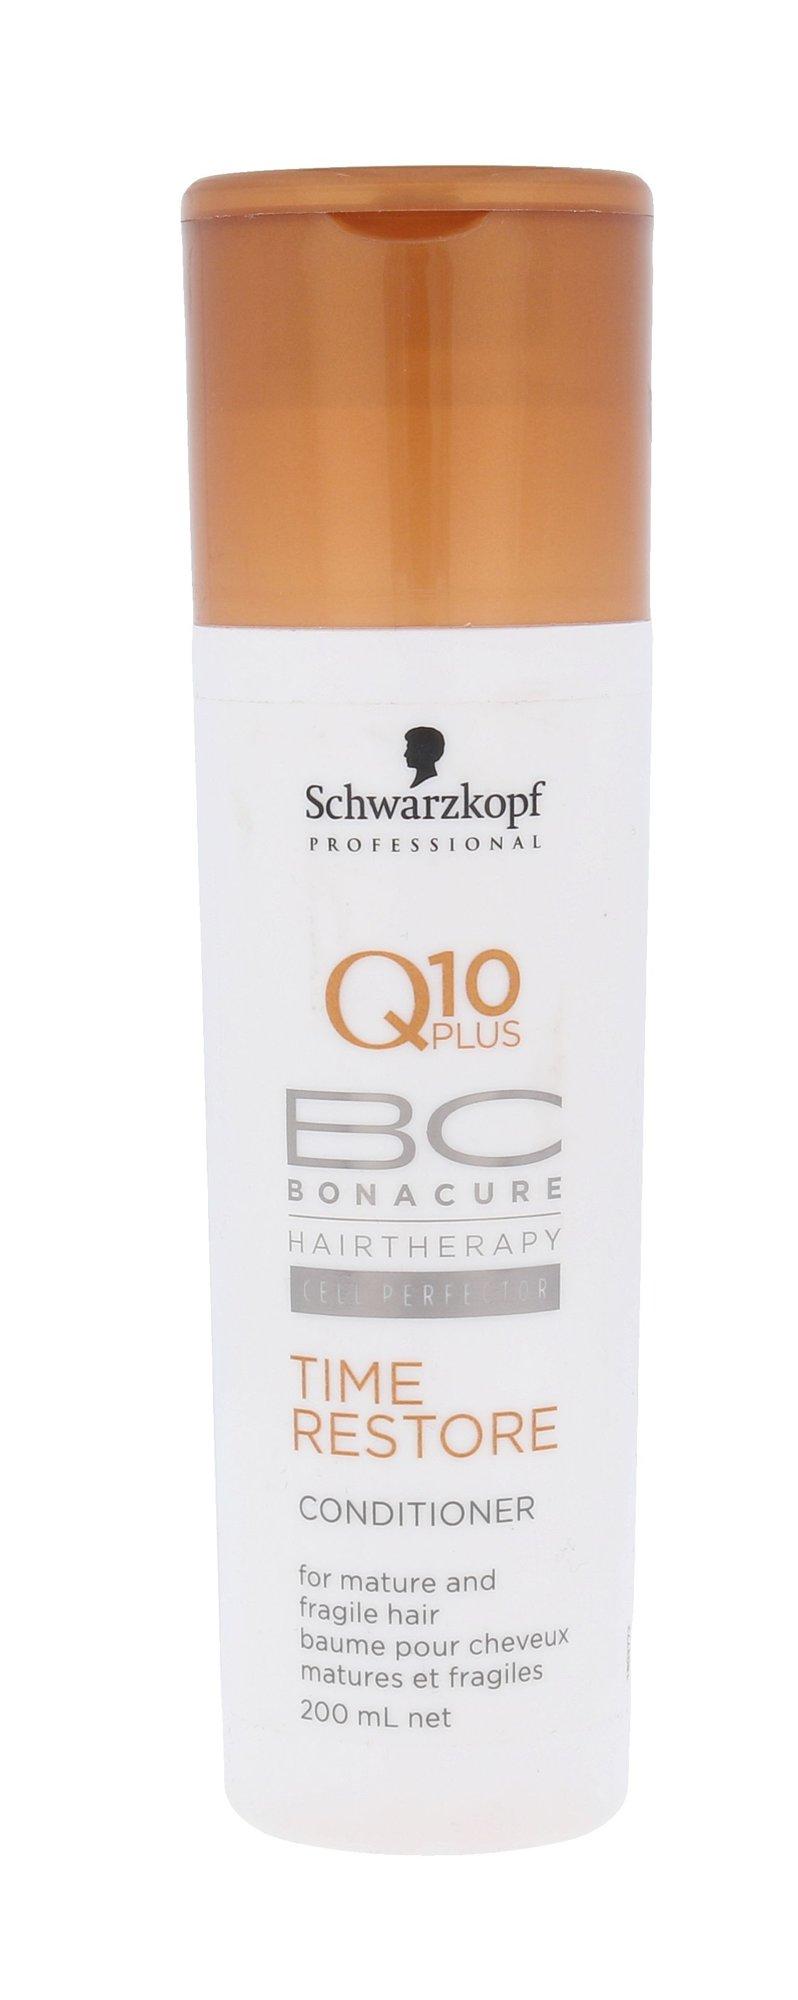 Schwarzkopf BC Bonacure Cosmetic 200ml